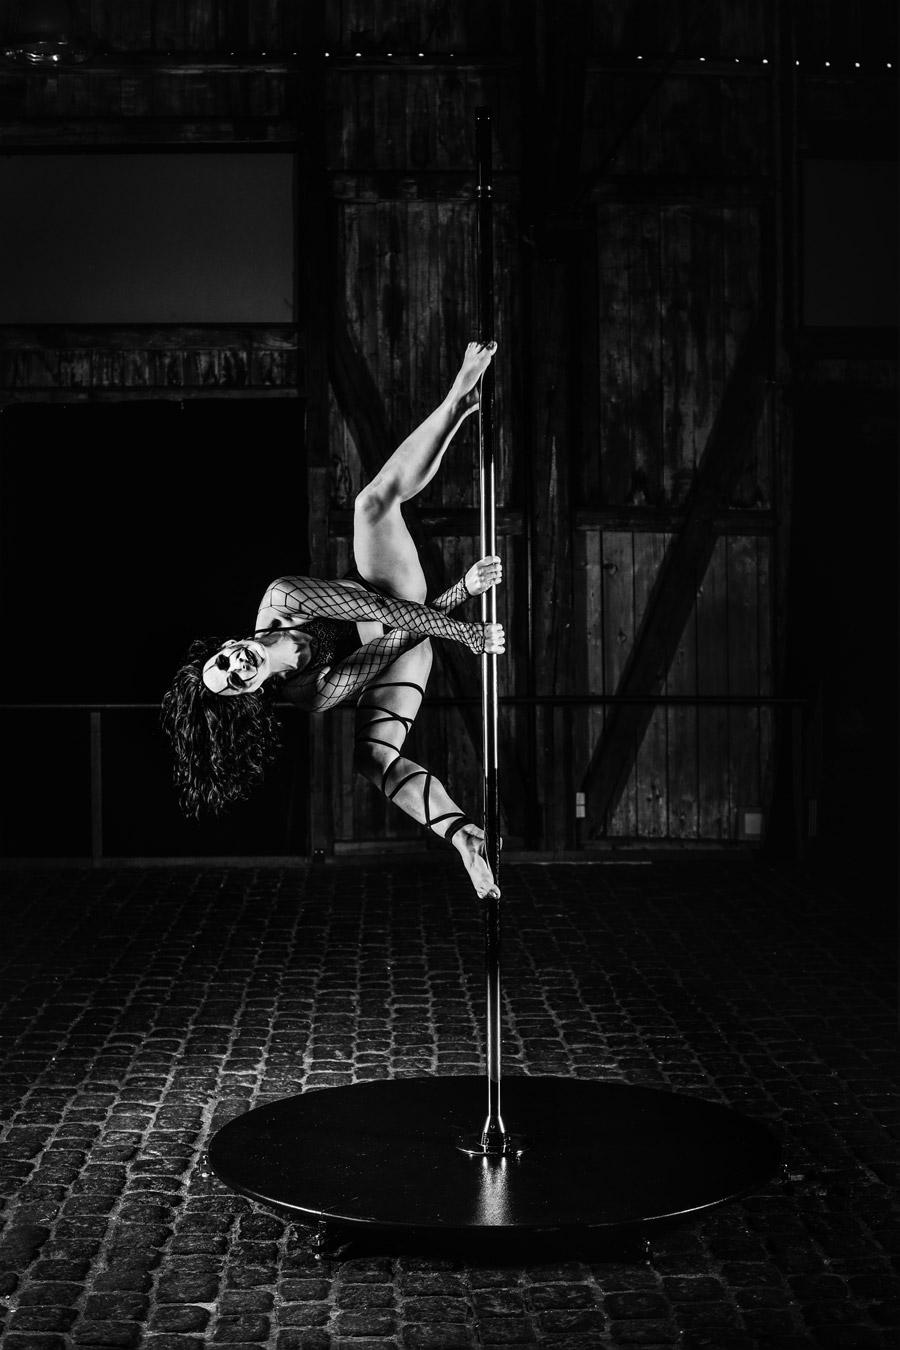 Gelungenes Pole Dance Shooting